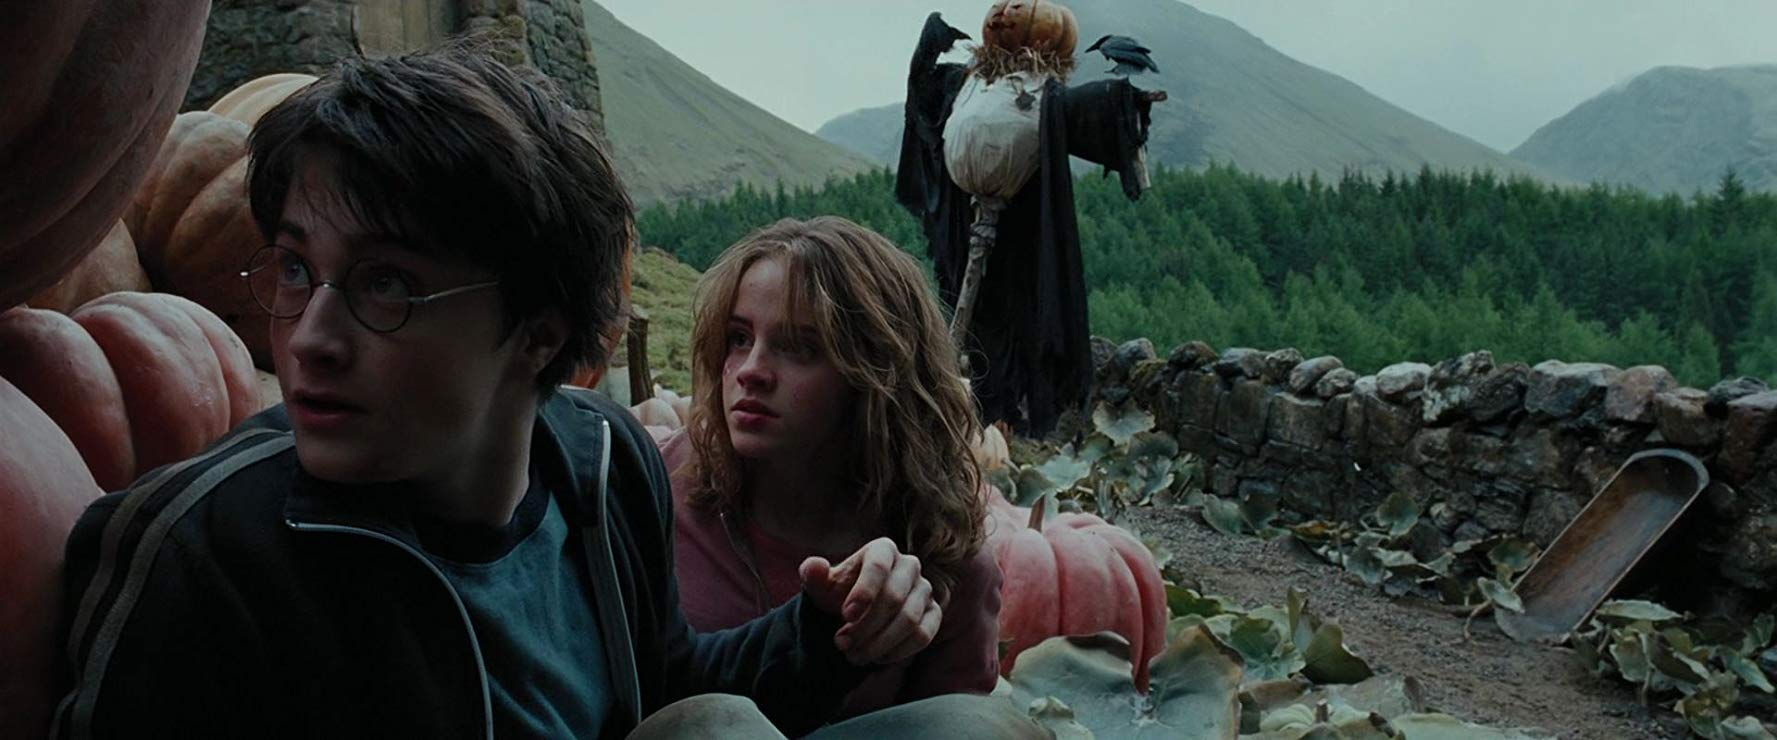 20 movies to watch on halloween 10.jpg